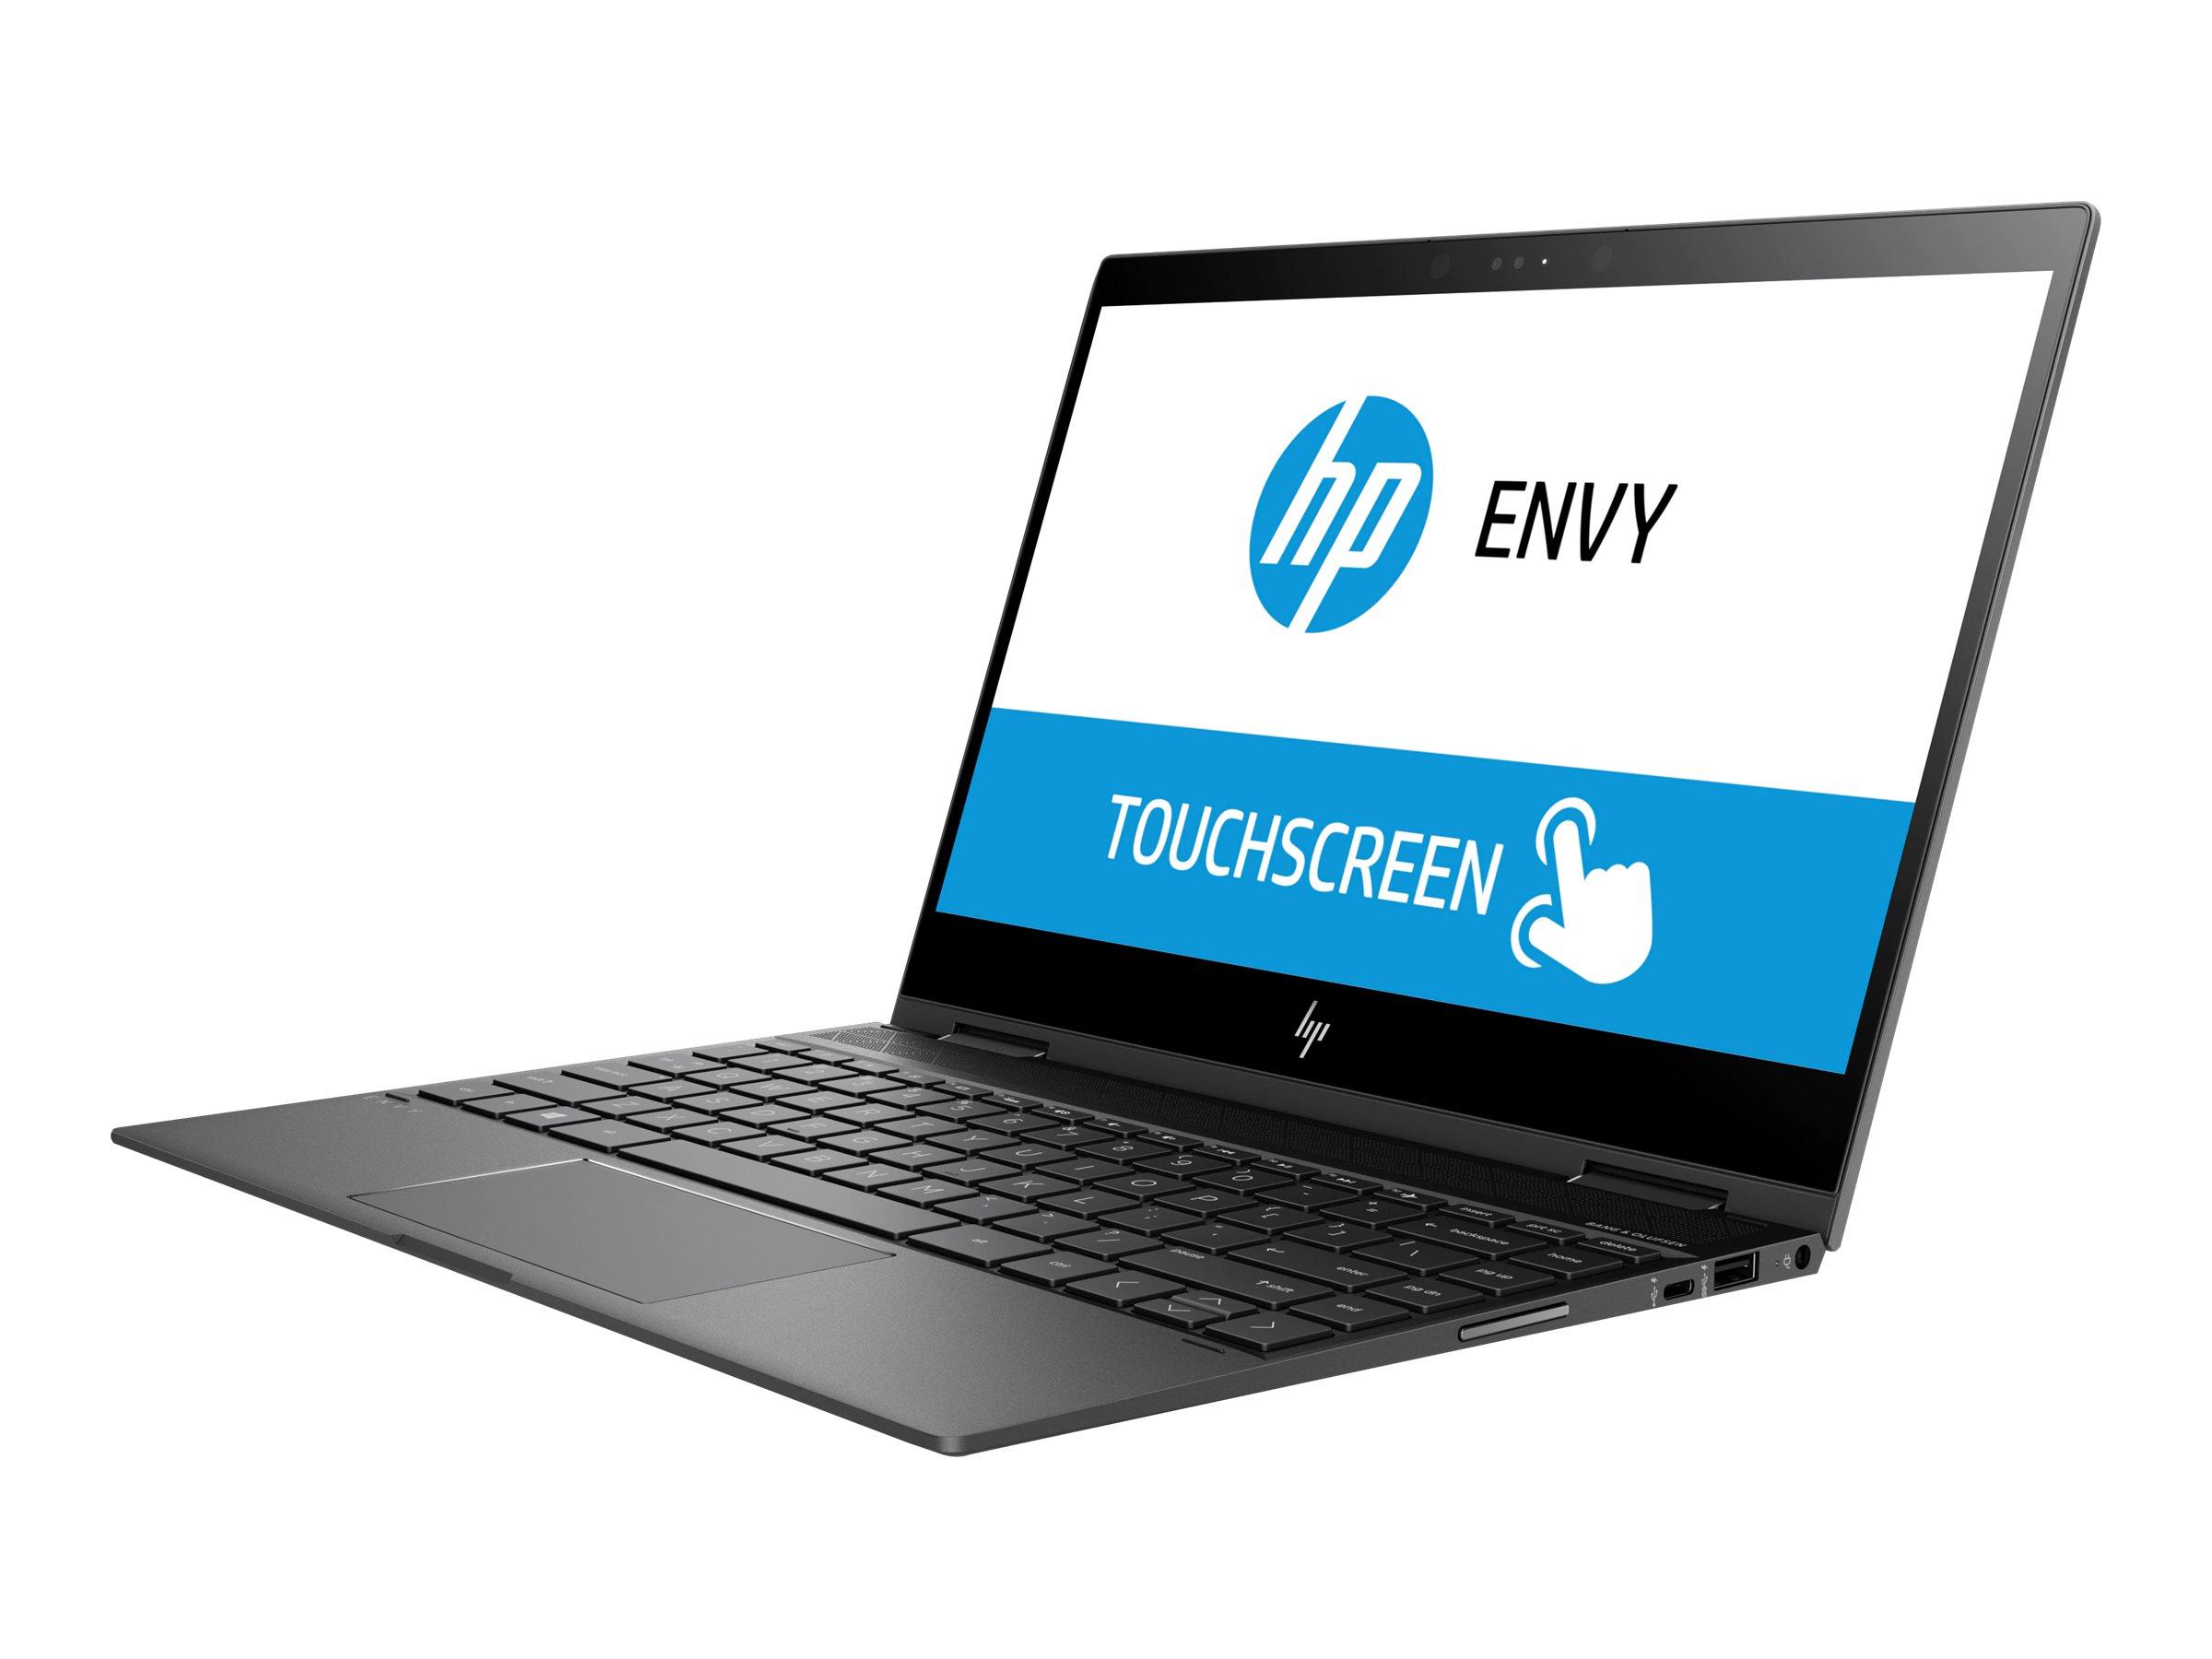 HP ENVY x360 13-ag0003ng 2GHz 2300U AMD Ryzen 3 13.3Zoll 1920 x 1080Pixel Touchscreen Schwarz - Silber Hybrid (2-in-1)